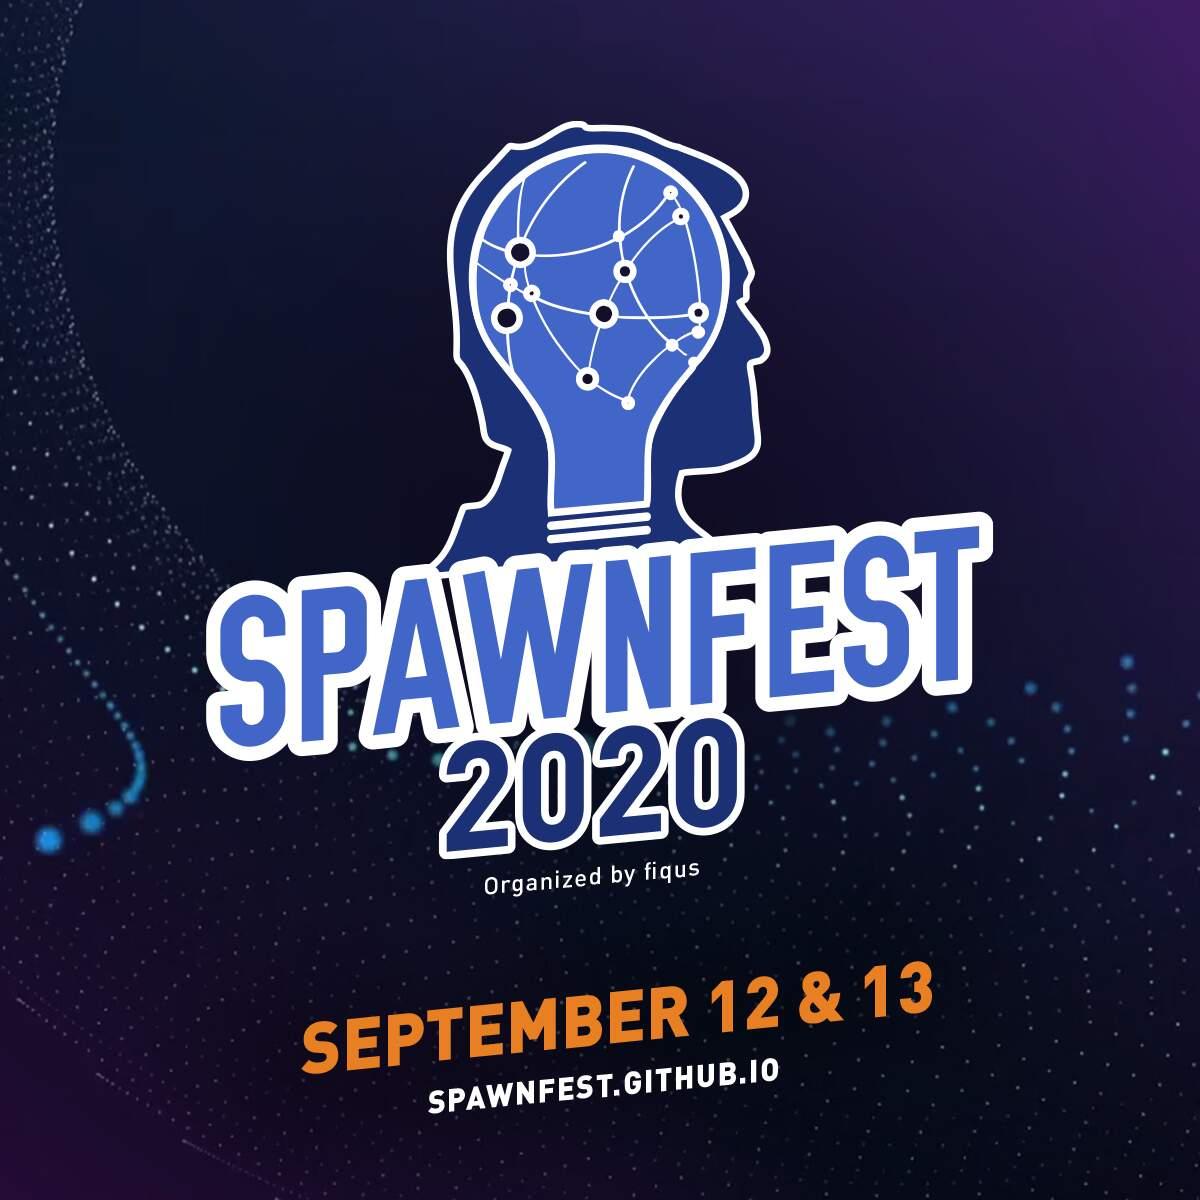 2020_04_08_Fiqus_SpawnFest_facebook